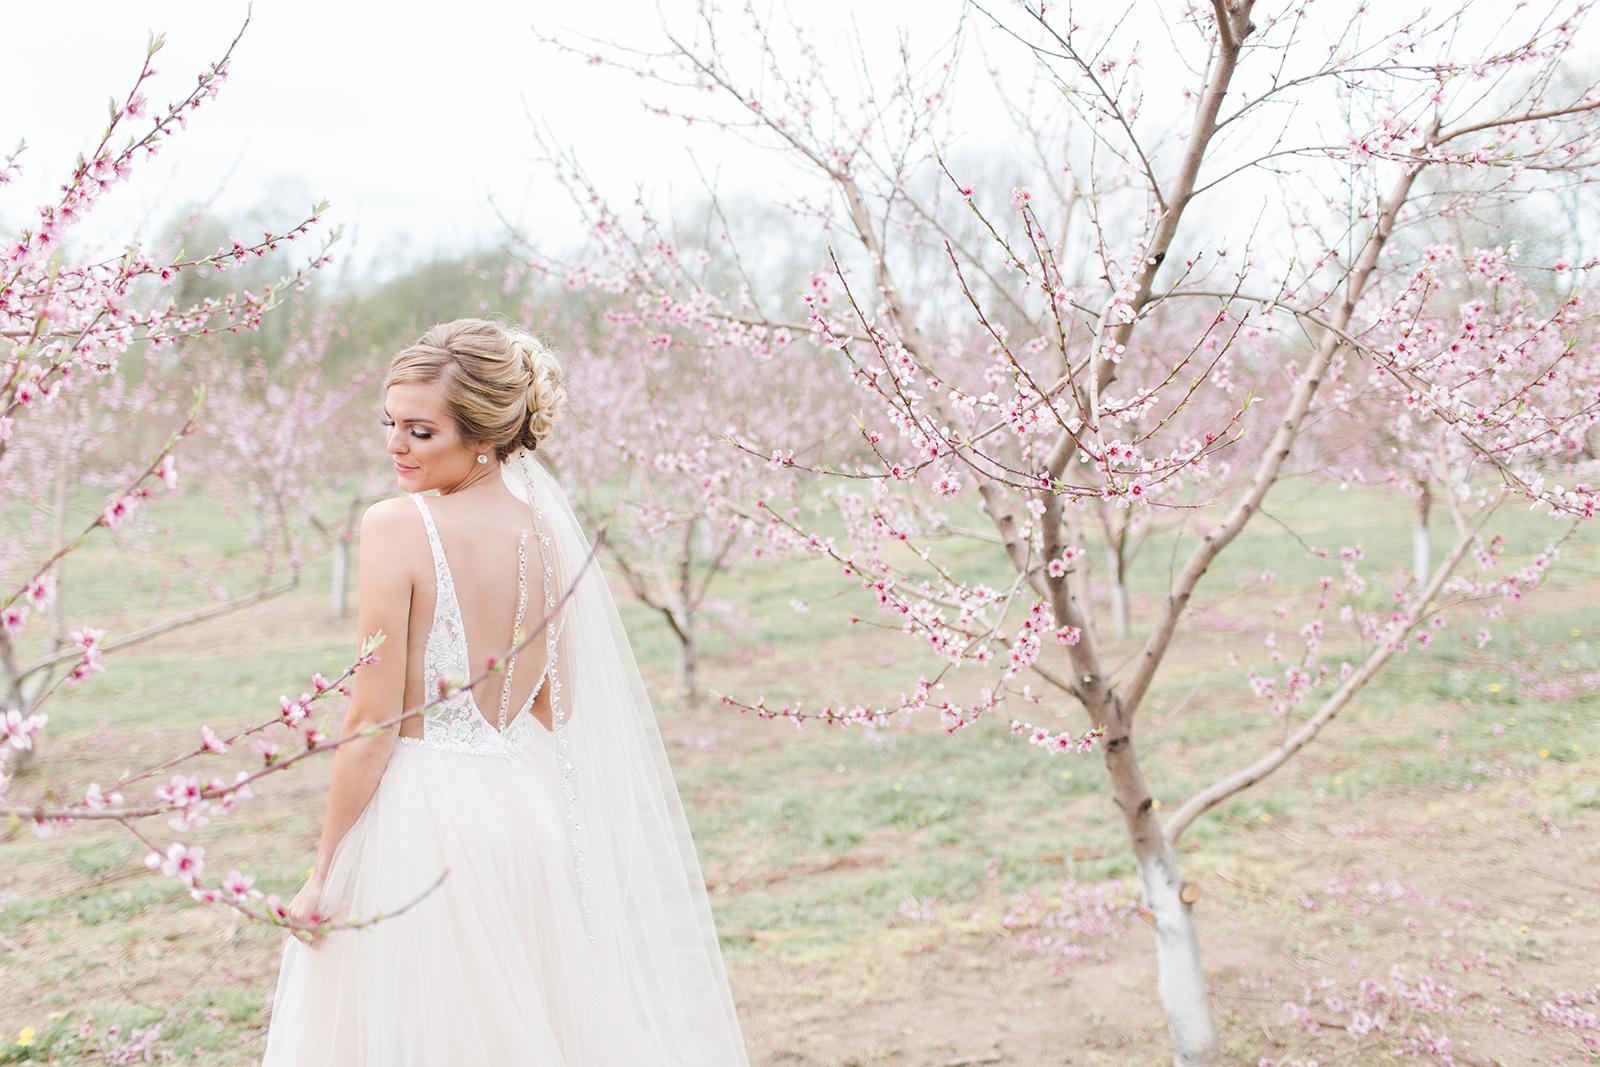 Makeup: Makeup by Jamie, Photo: Arielle Peters Photography, Venue: Apple Blossom Chapel & Gardens, Dress & Veil: Becker's Bridal, Hair: Tova Salon, Model: Maggie Sapp